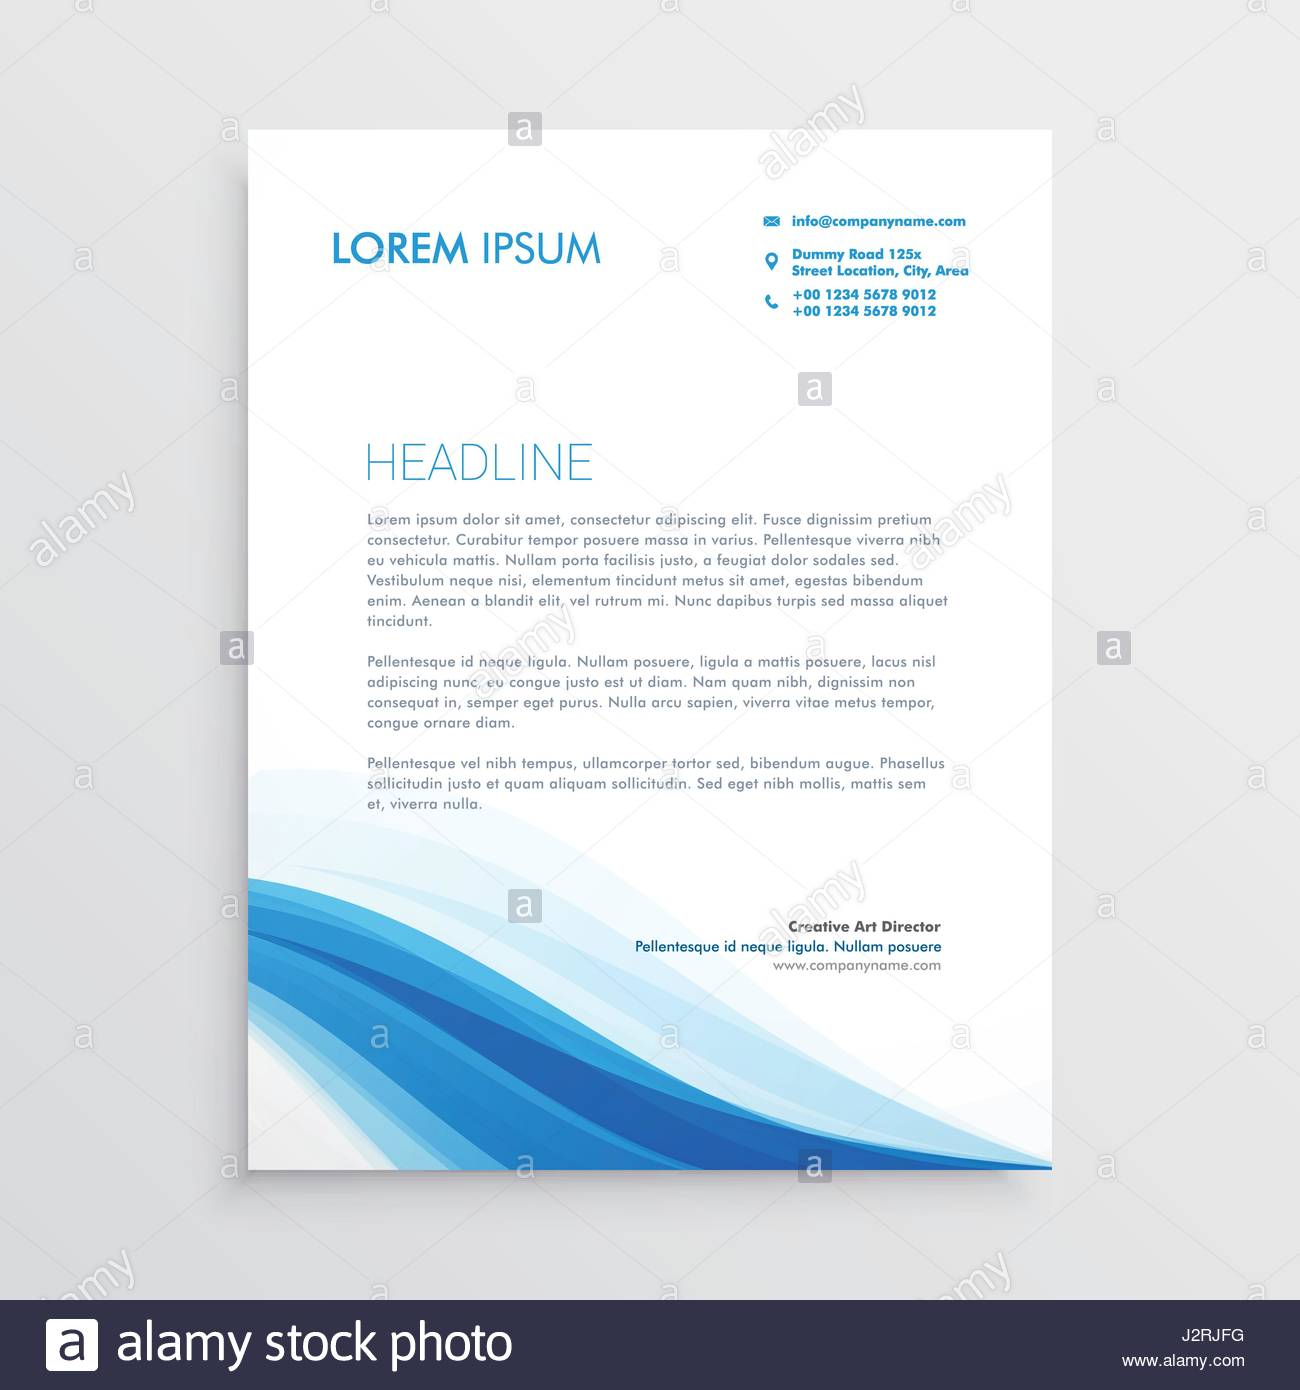 Kreative Blaue Gewellte Form Briefkopf Design Vektor Abbildung